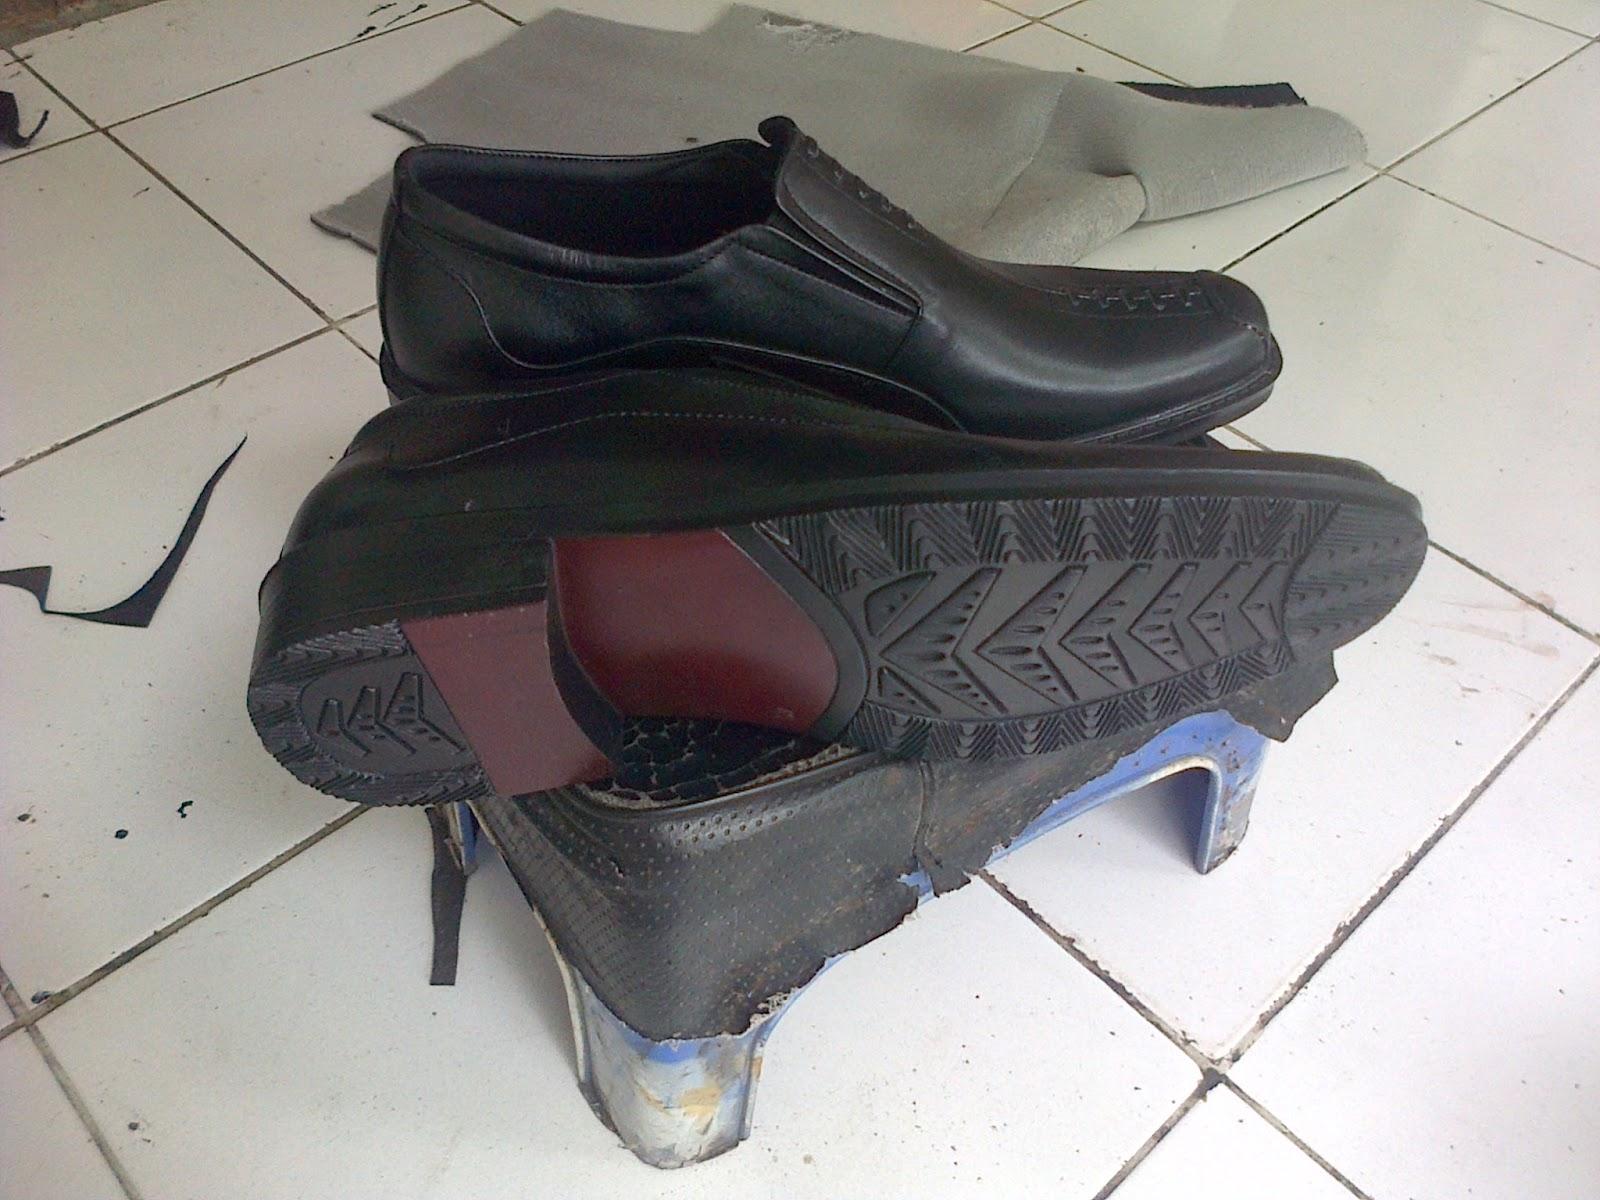 Aksesoris Dompet Tas Sepatu Sandal Kulit: Grosir Aksesoris ...